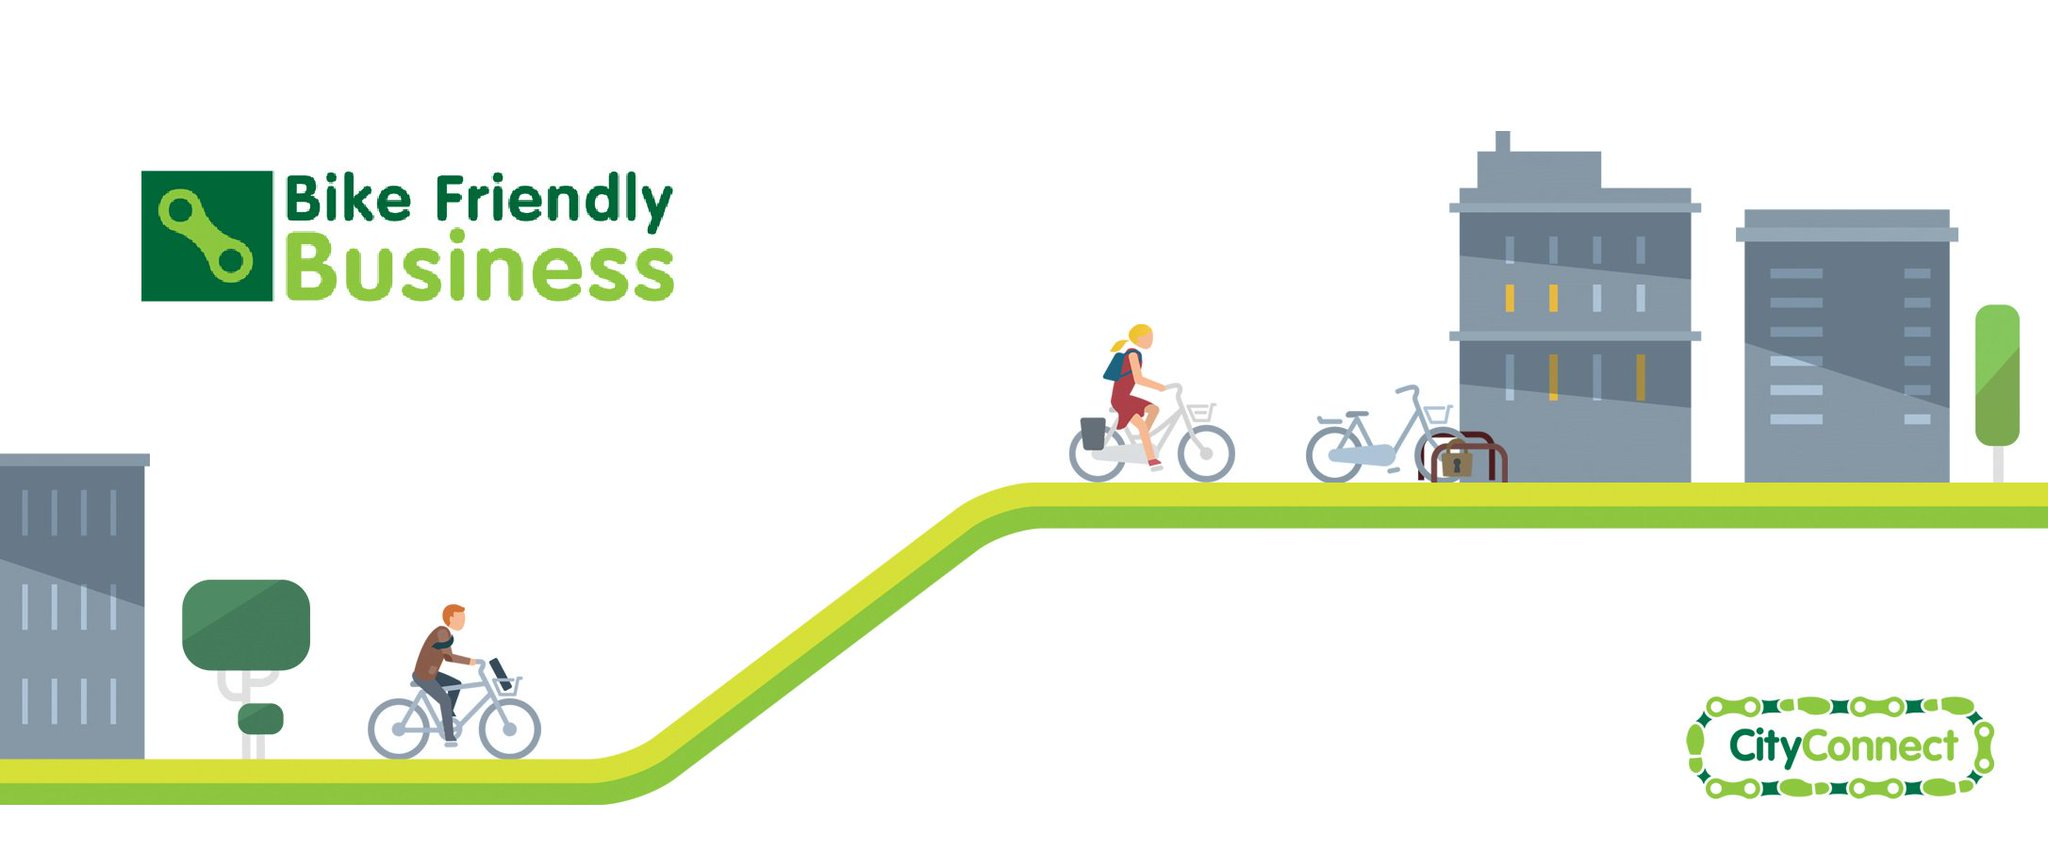 FREE Bike Friendly Business masterclass, 11 May, 10.30am - 12pm in #Bradford. https://t.co/KQAZ0VHpRR @bradfordmdc #Cycleactivecity https://t.co/Ffczy6UPrv